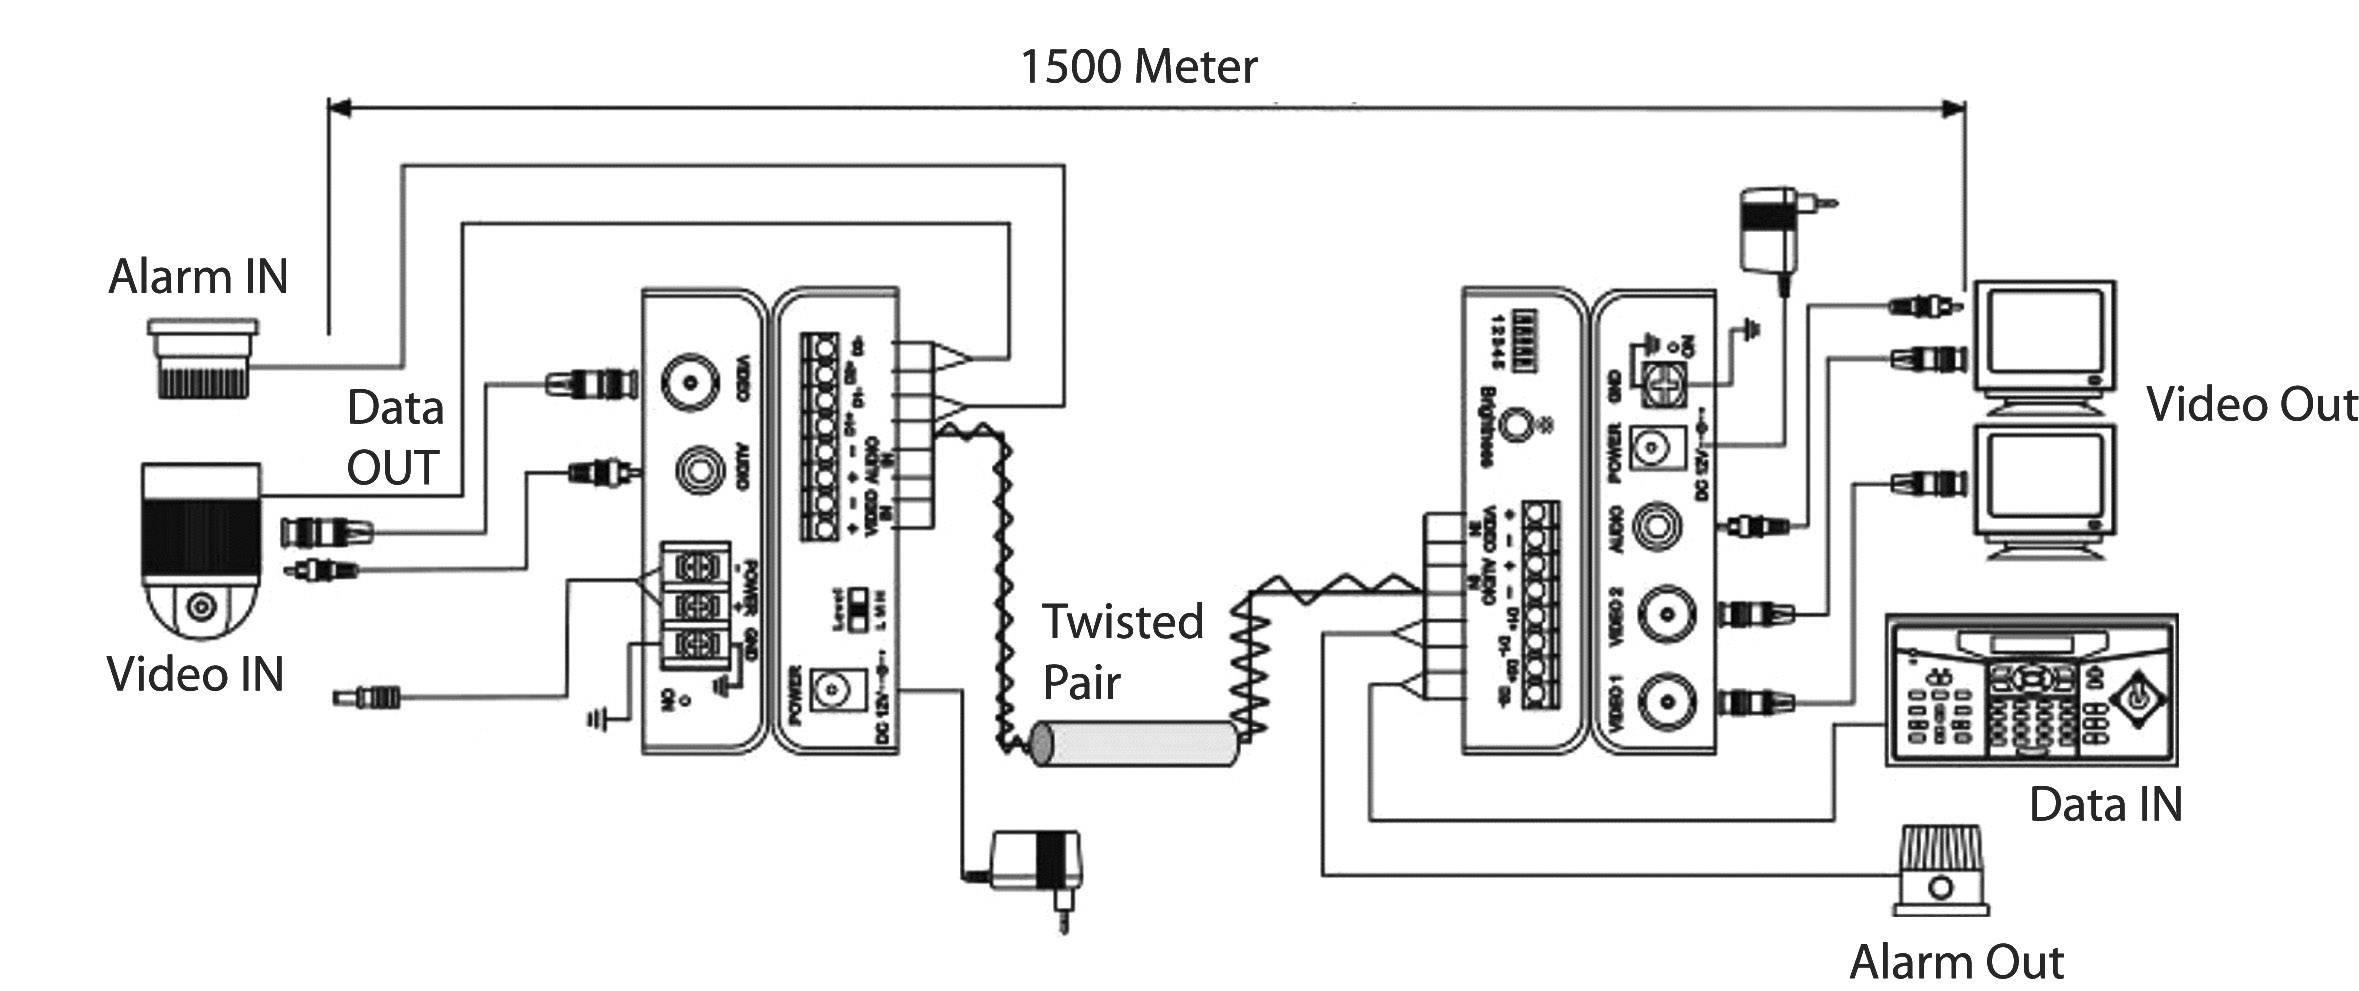 medium resolution of abus wiring diagram wiring diagrams scematic abus hoist parts abus crane electrical diagram